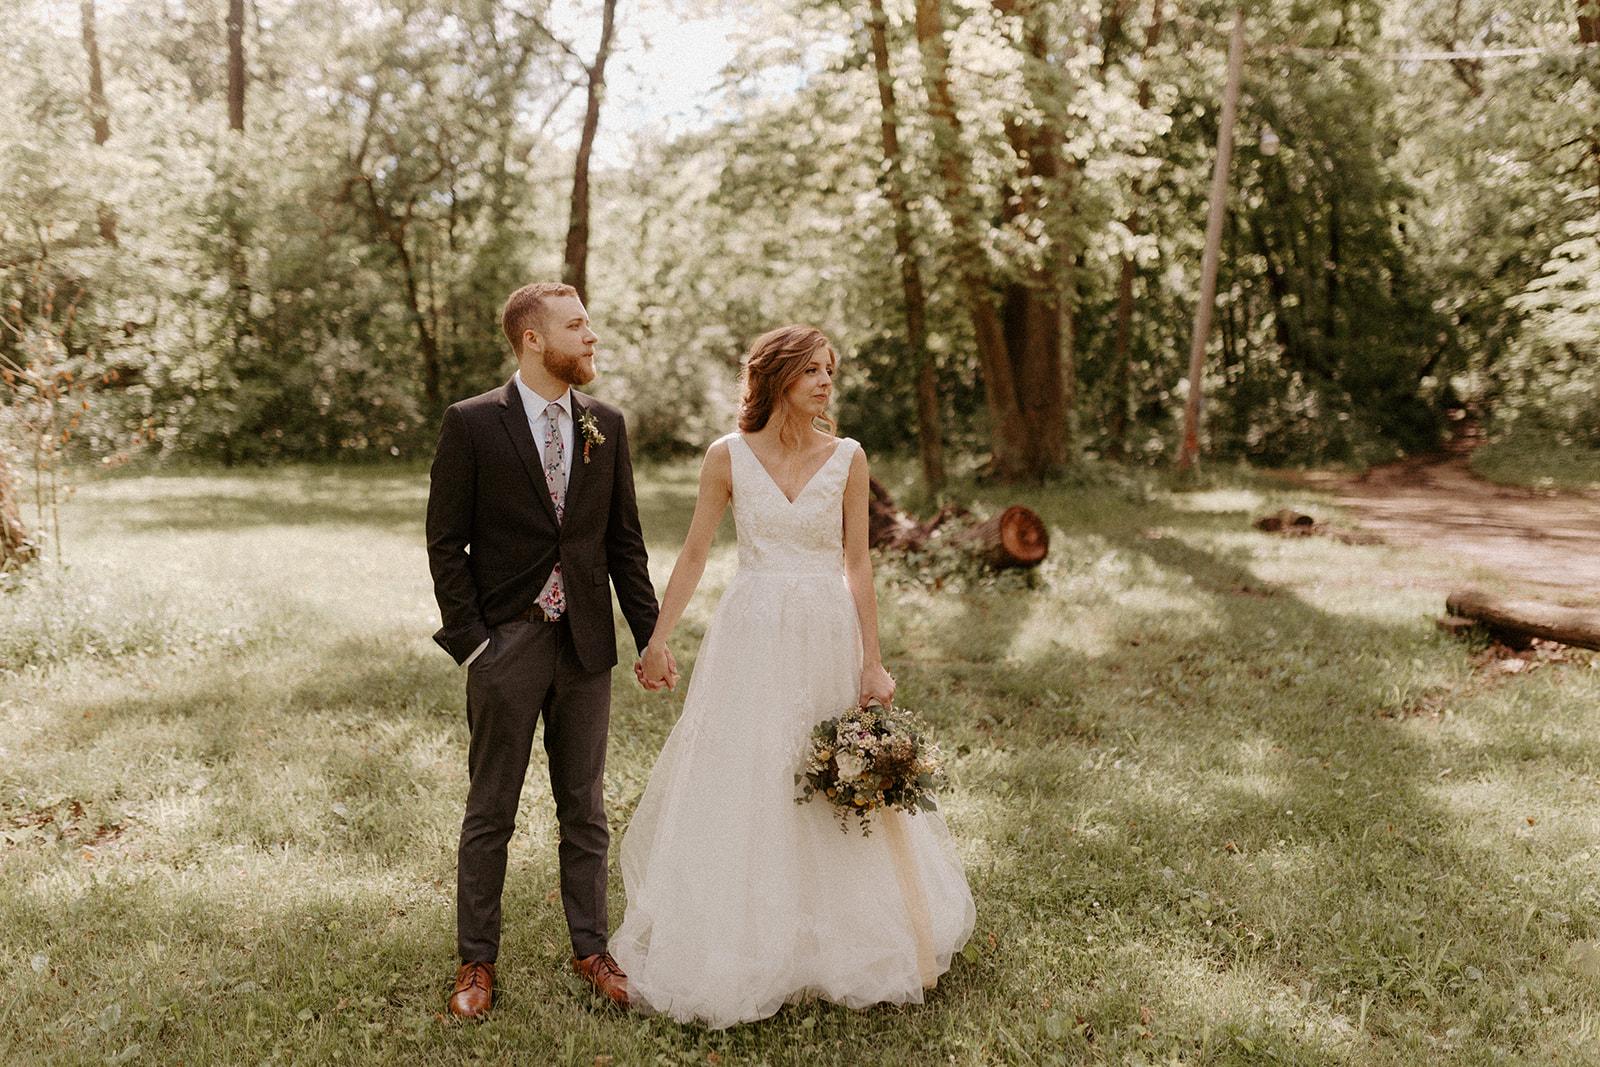 camp_wokanda_peoria_illinois_wedding_photographer_wright_photographs_bliese_0619.jpg